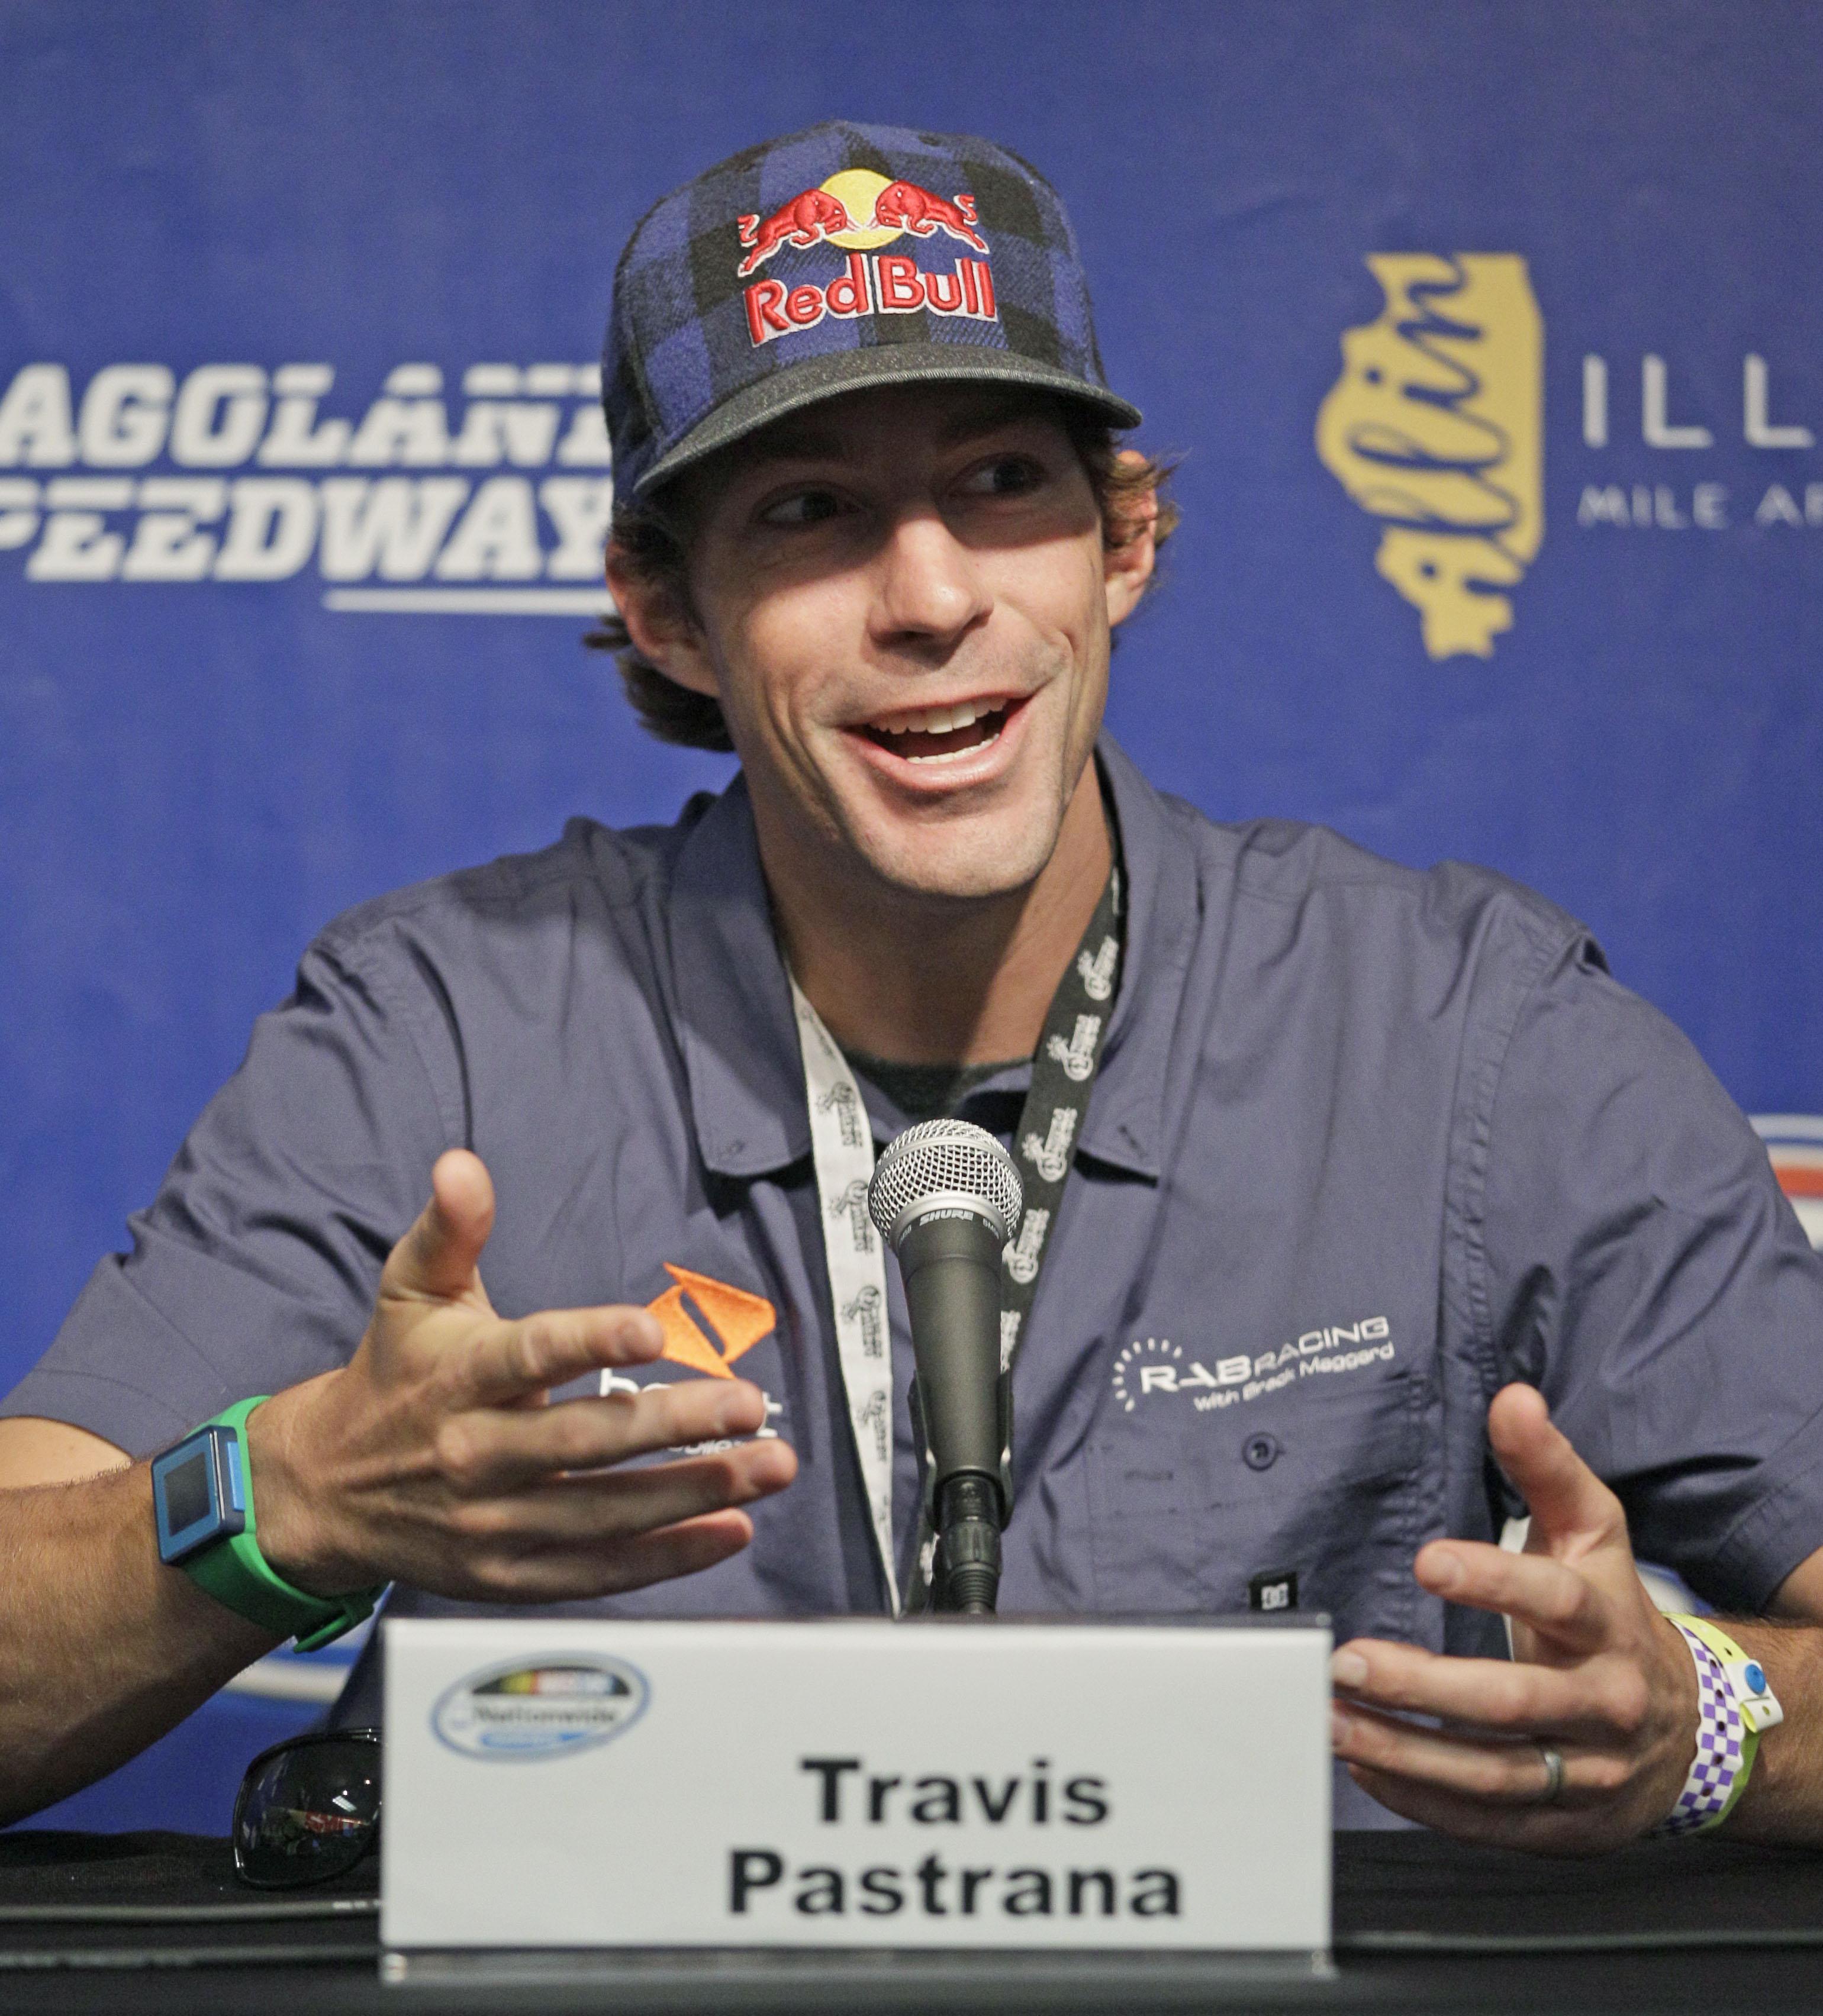 Travis Pastrana leaving NASCAR after season finale